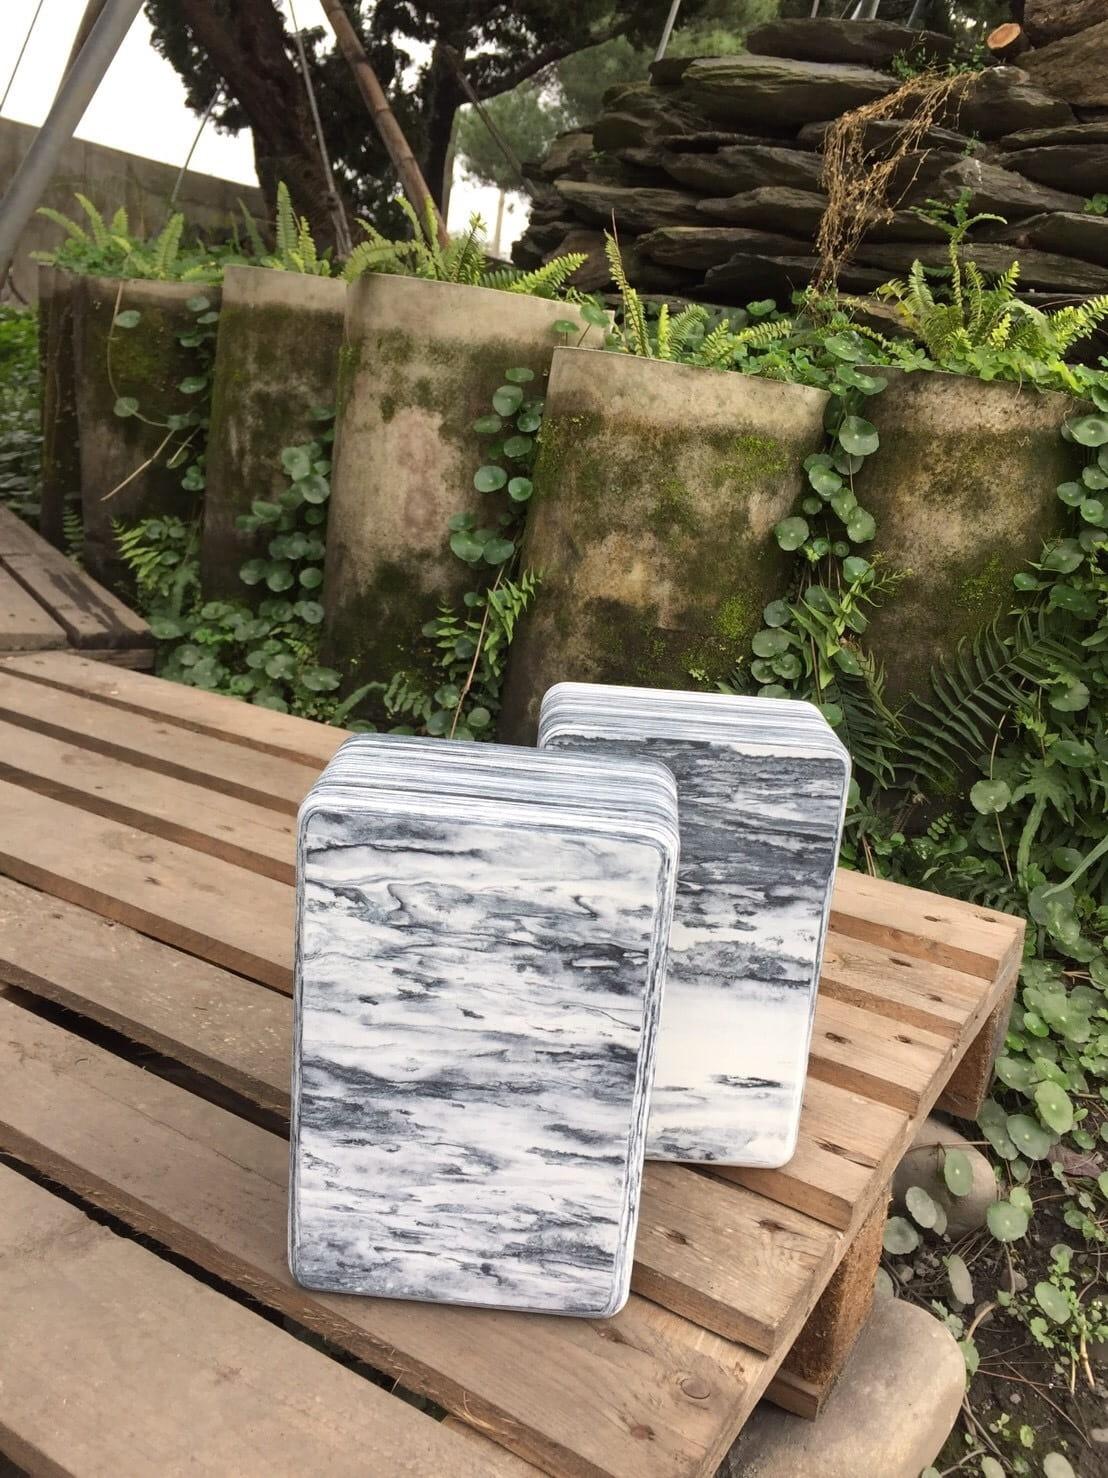 【QMAT】 40D瑜珈磚 混色系-青銅石紋、黑白雲彩 3